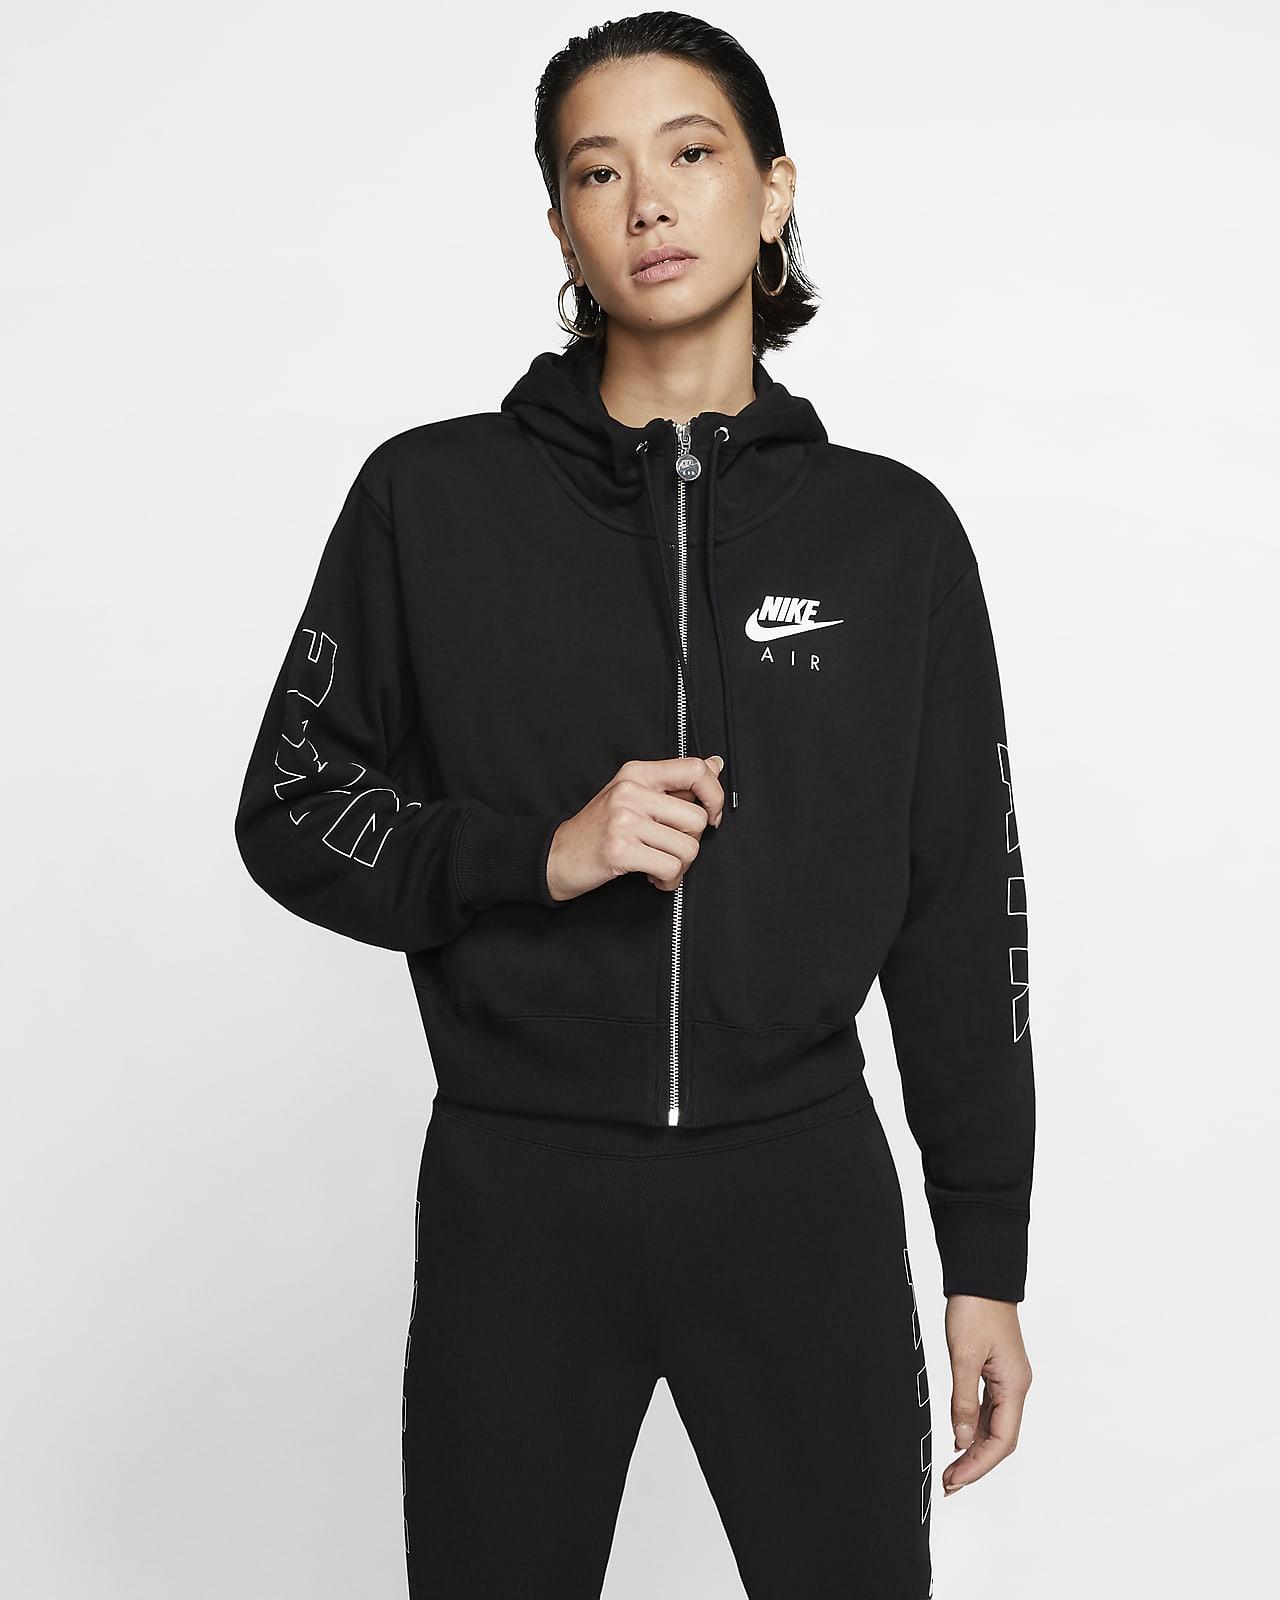 Nike Air hosszú cipzáras, kapucnis női polárpulóver